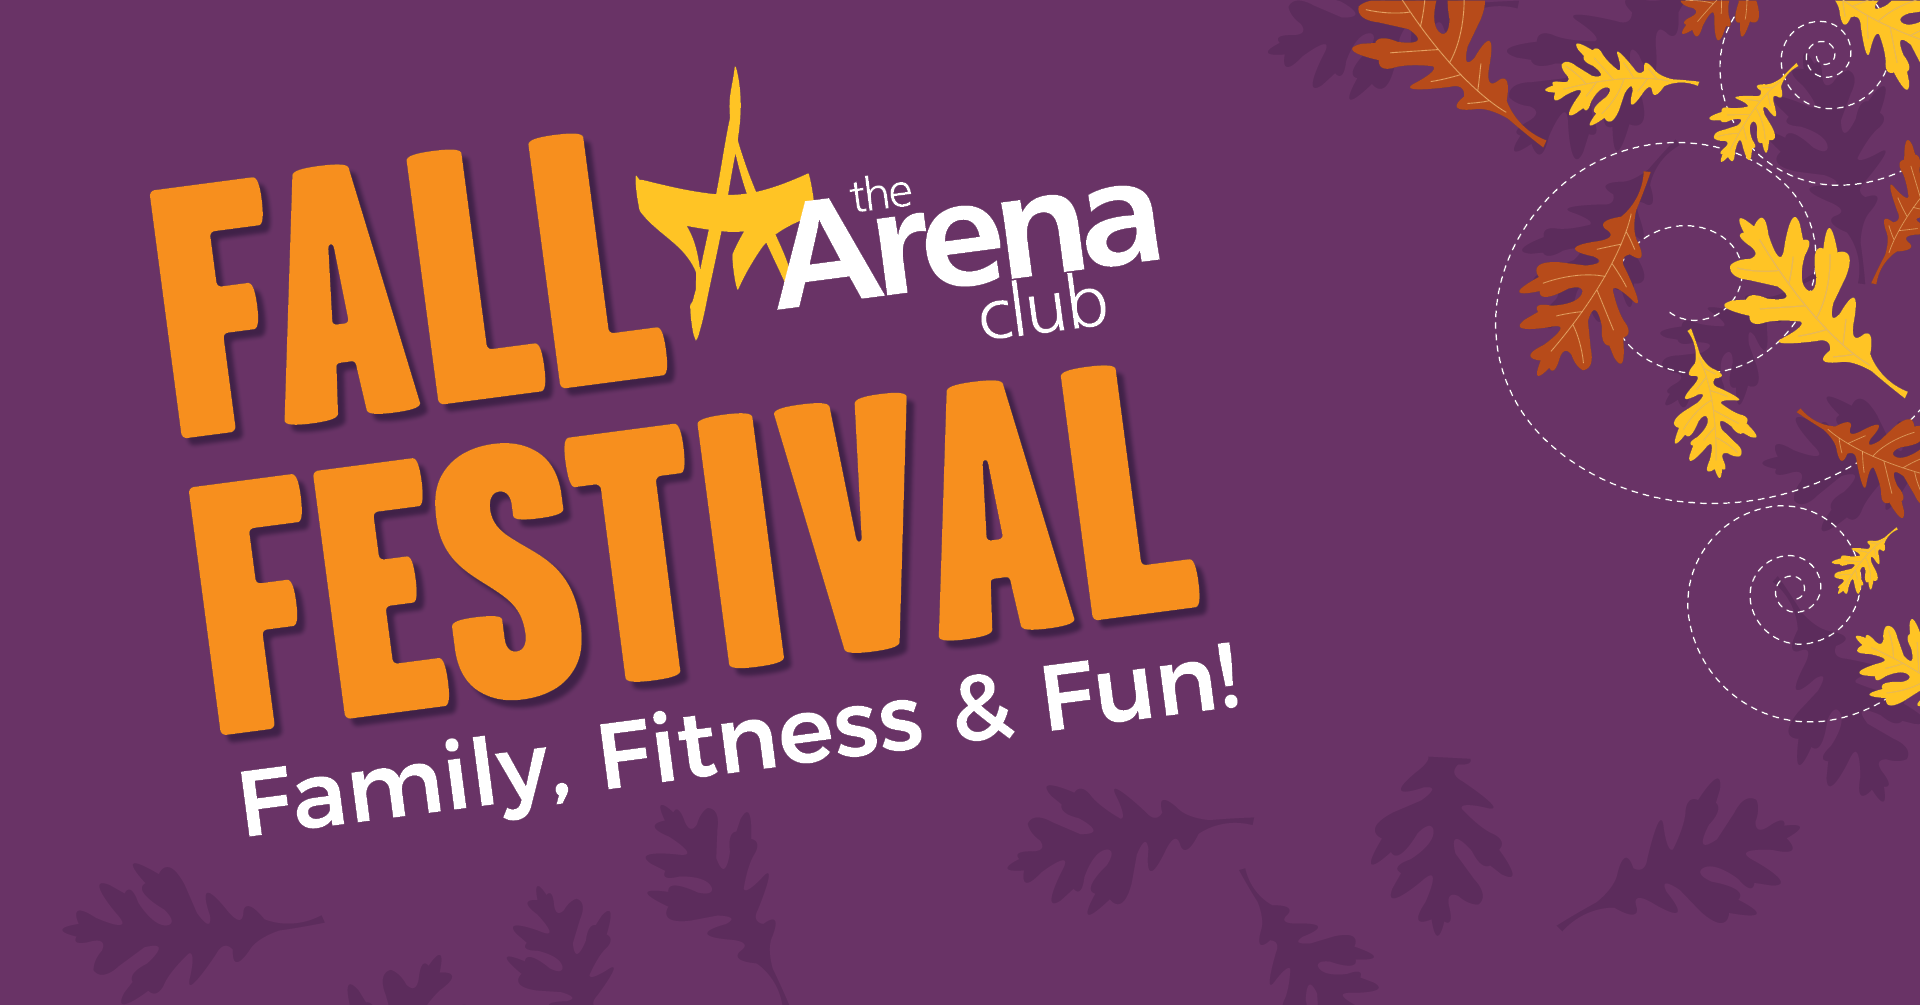 Fall Festival - Facebook EVENT Cover Photo